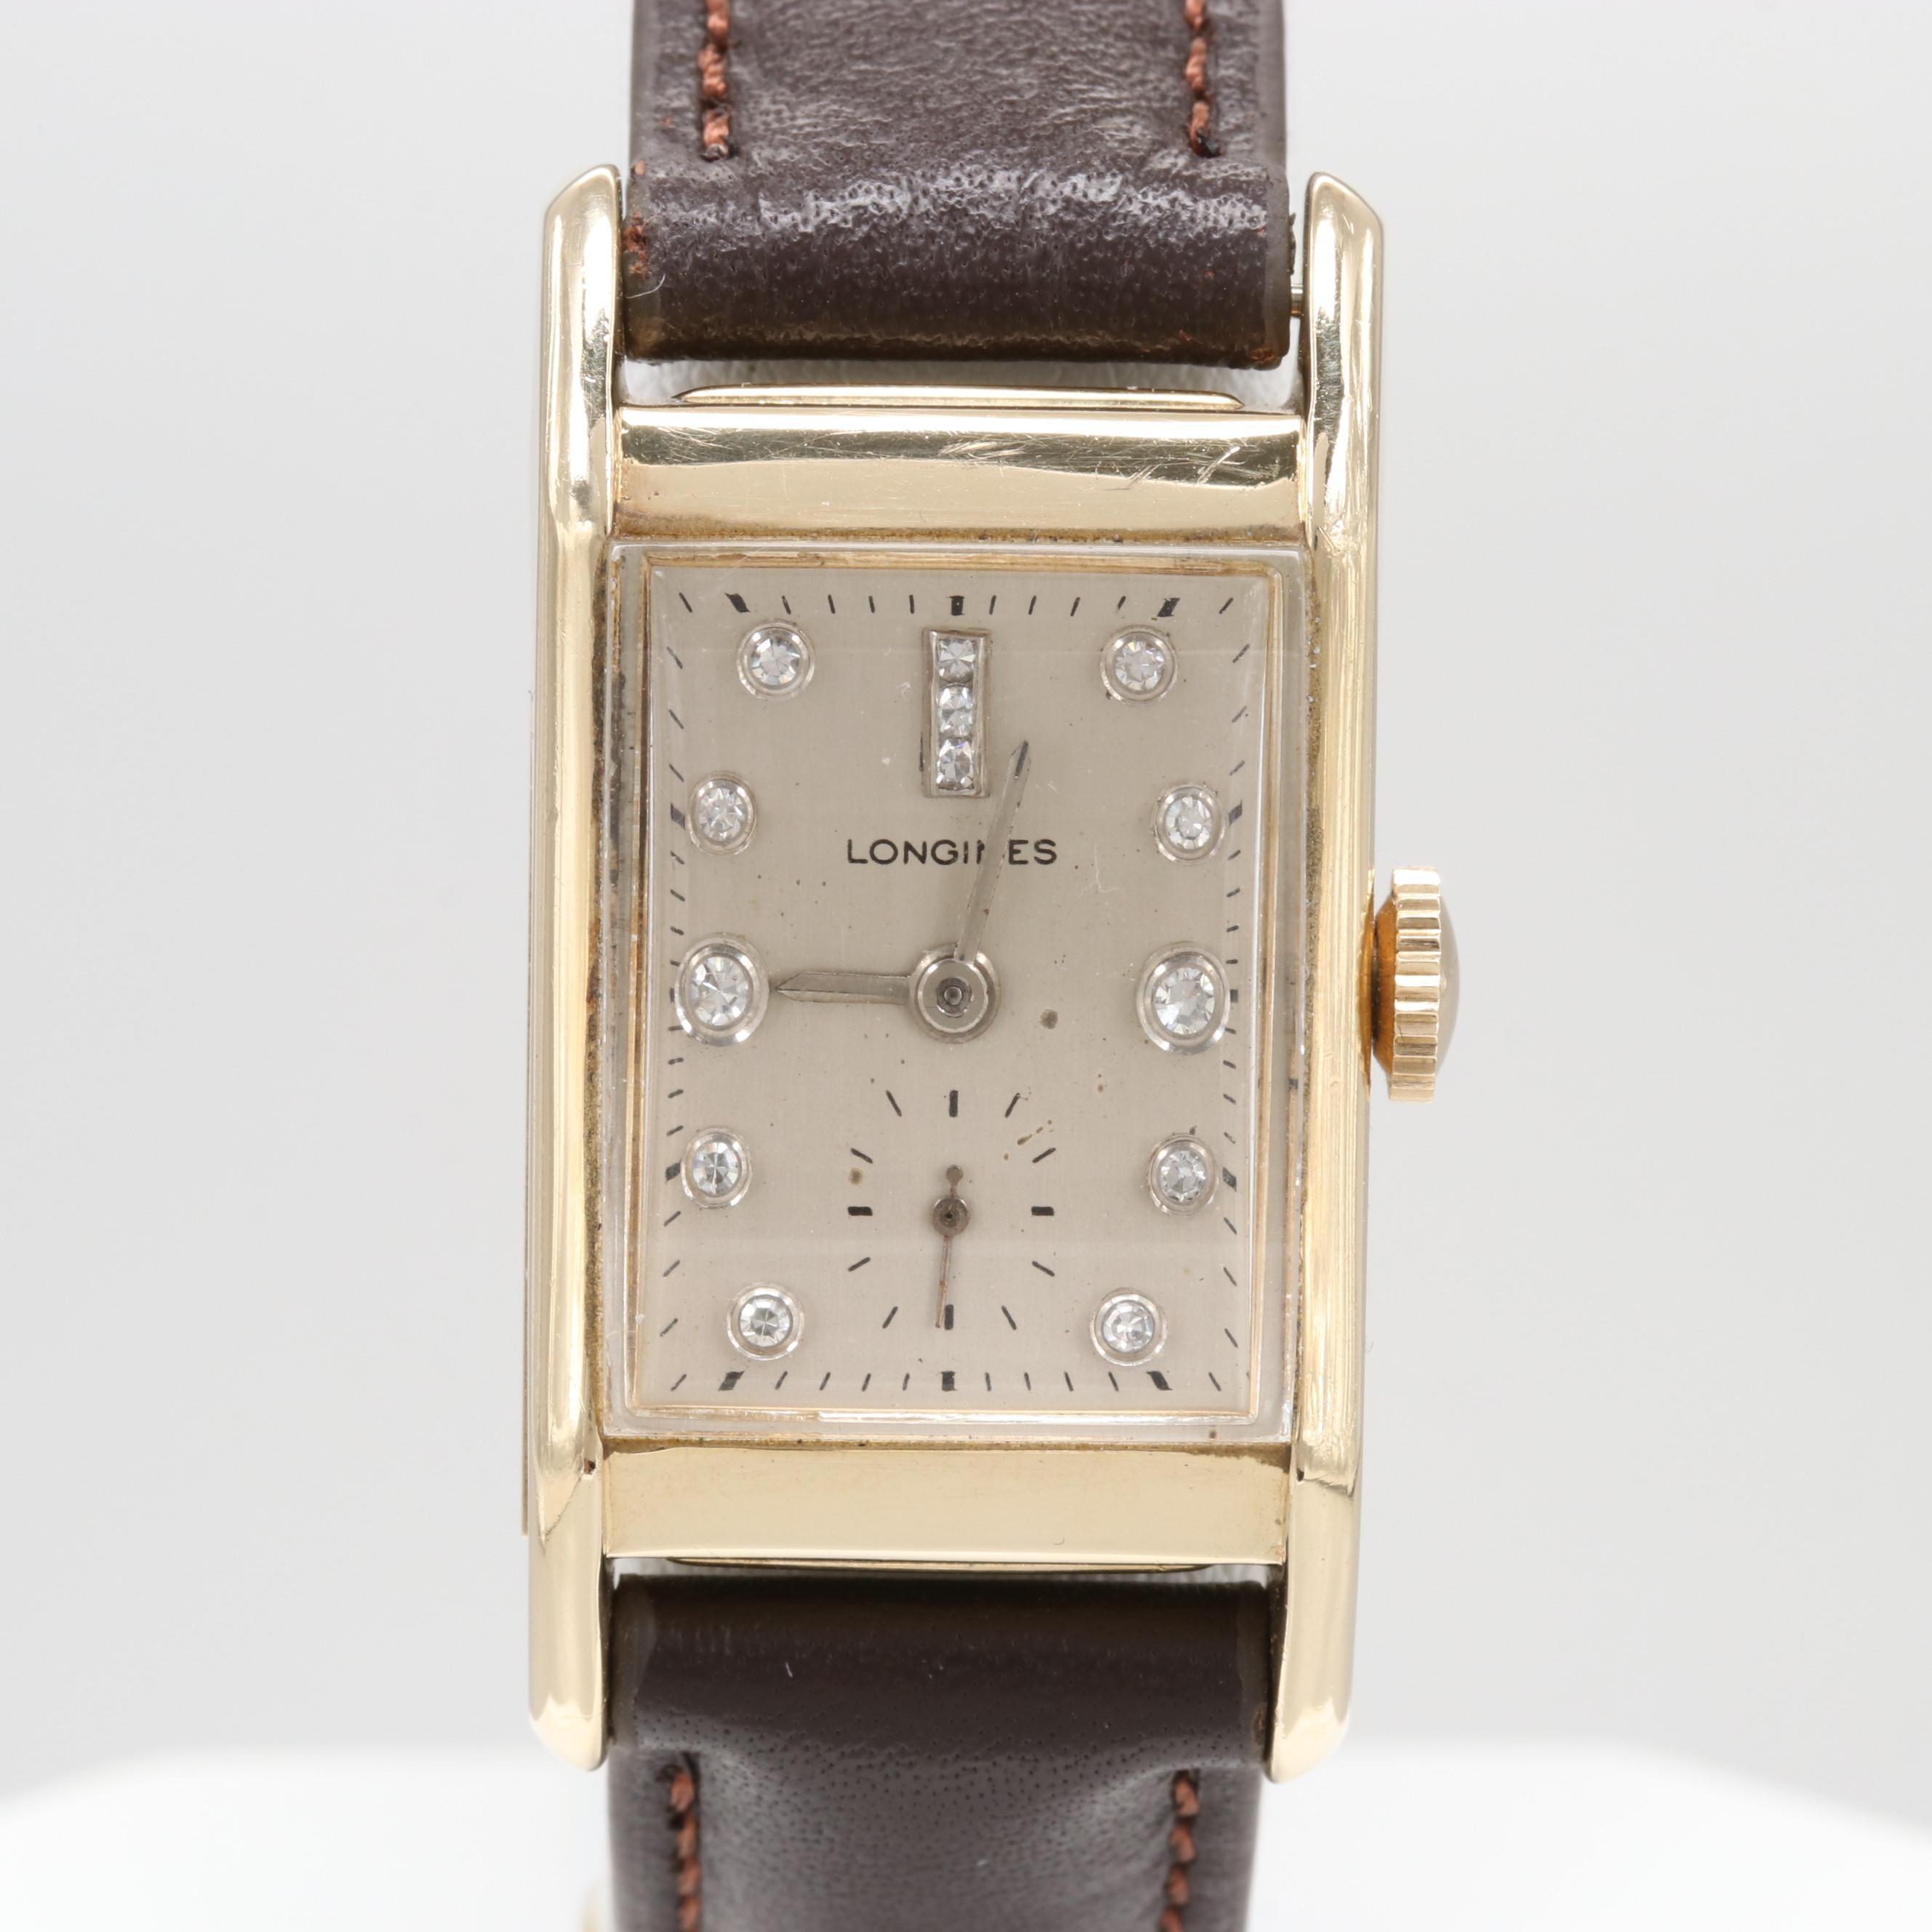 Vintage Longines 14K Yellow Gold Stem Wind Wristwatch With Diamond Dial